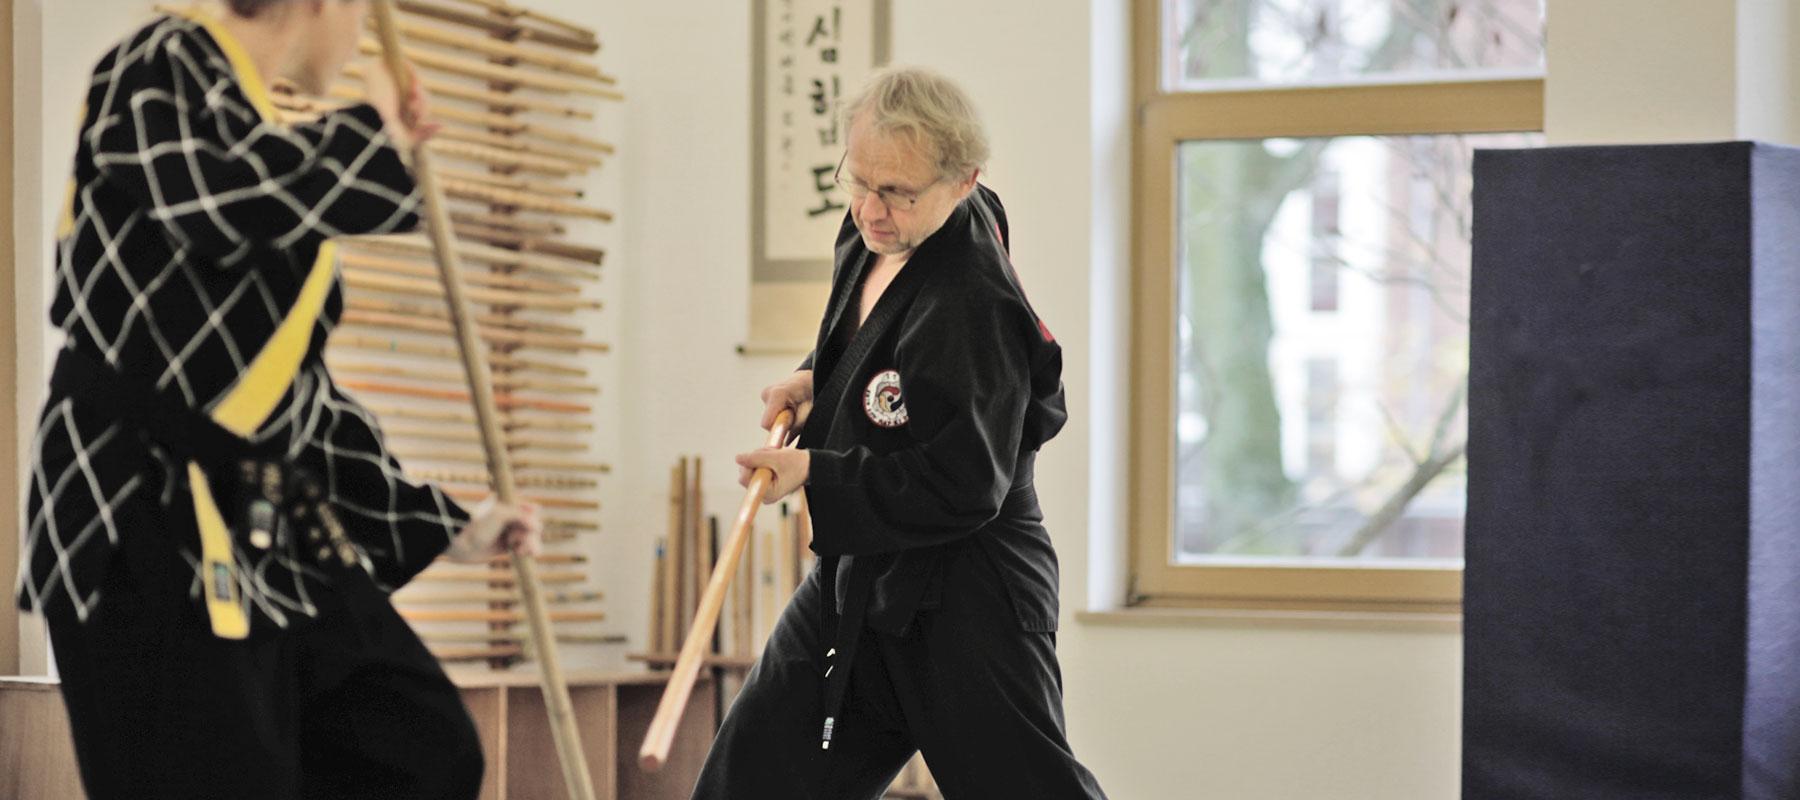 Shinson Hapkido St. Pauli